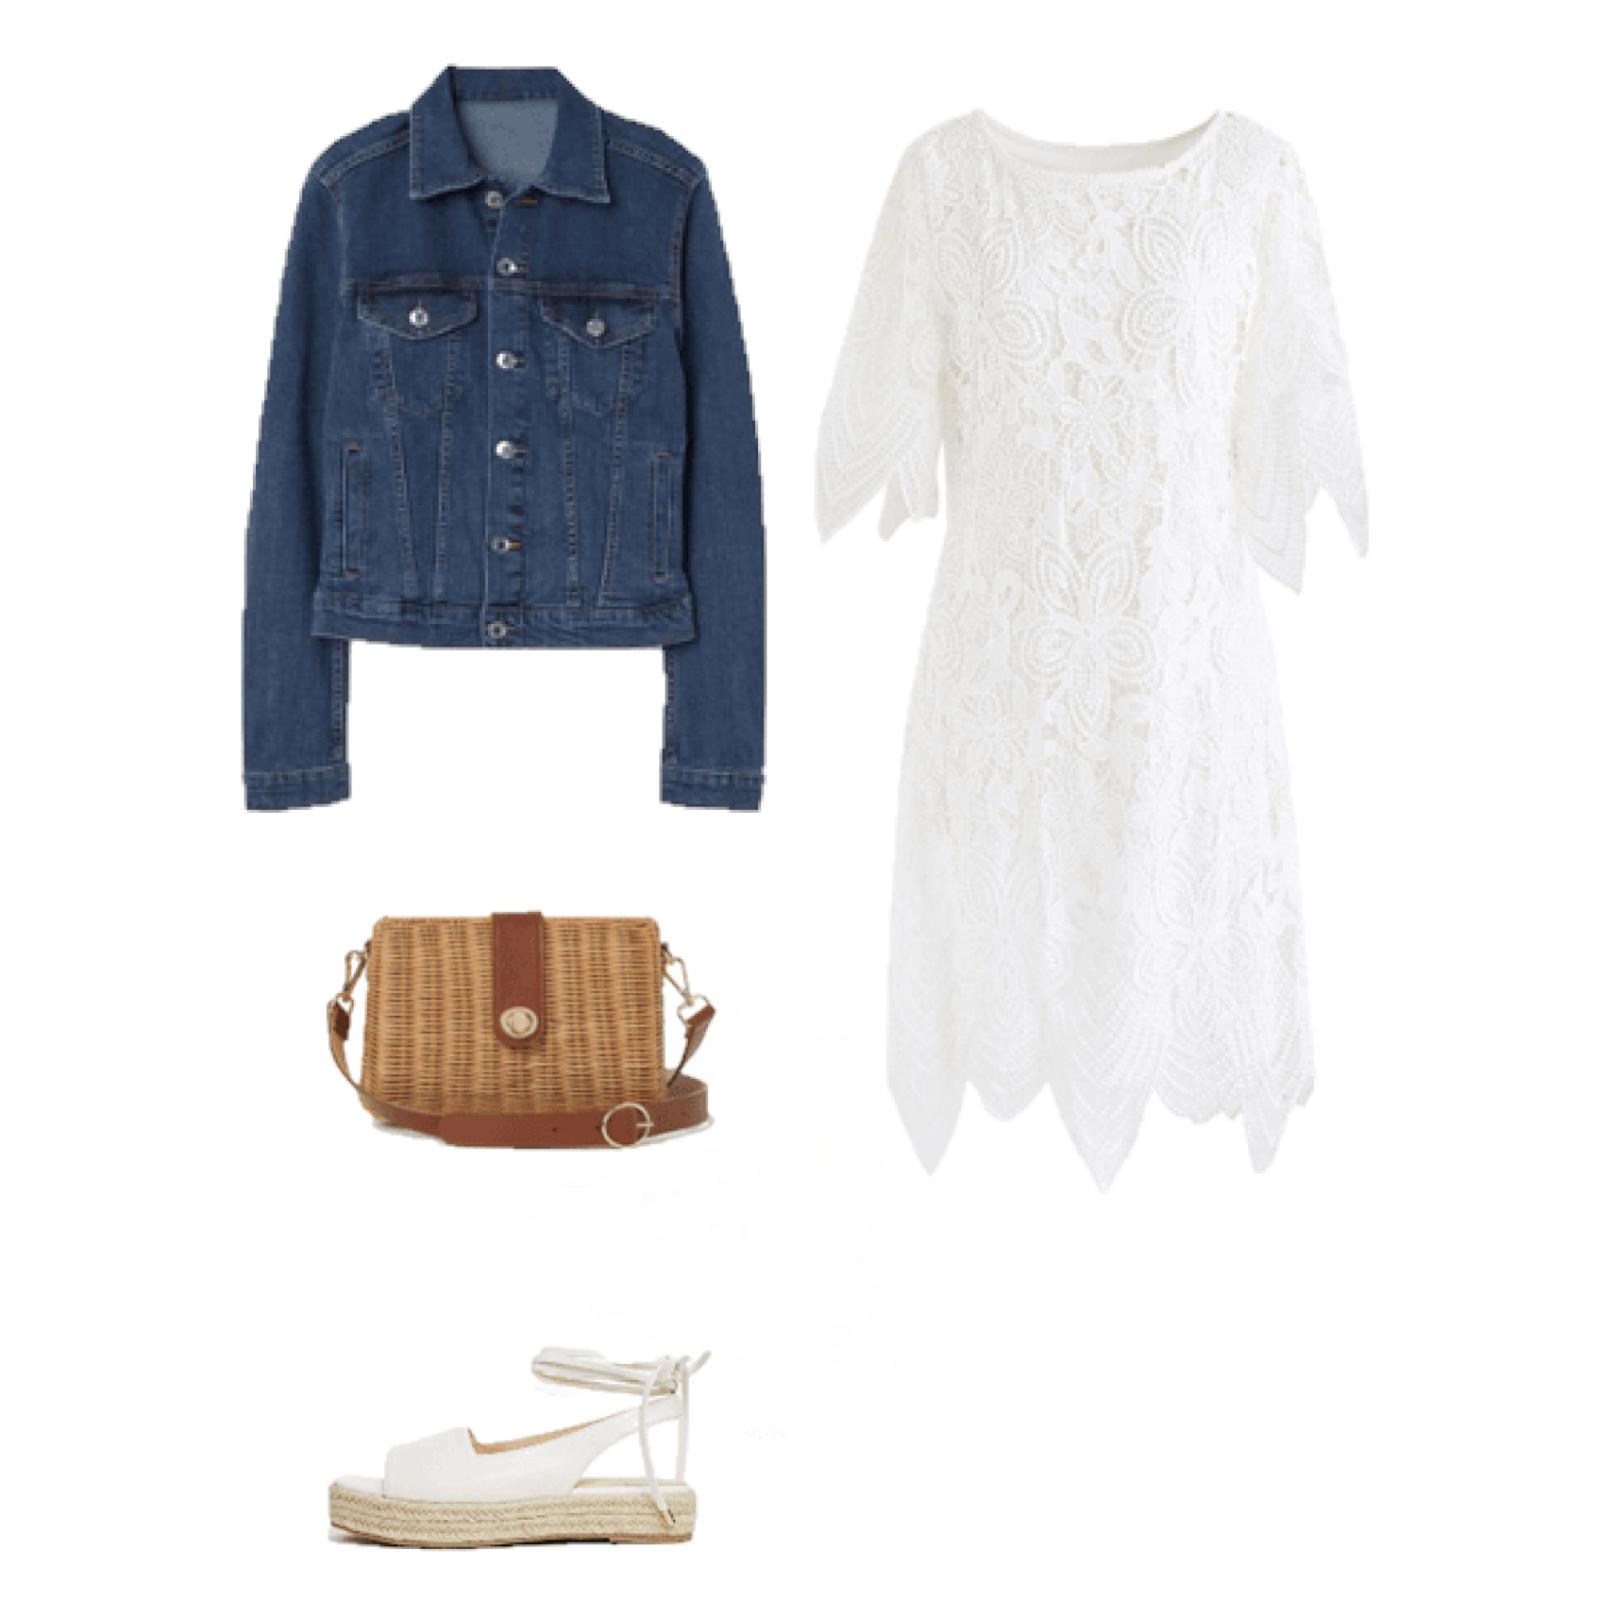 White dresses for Spring and Summer